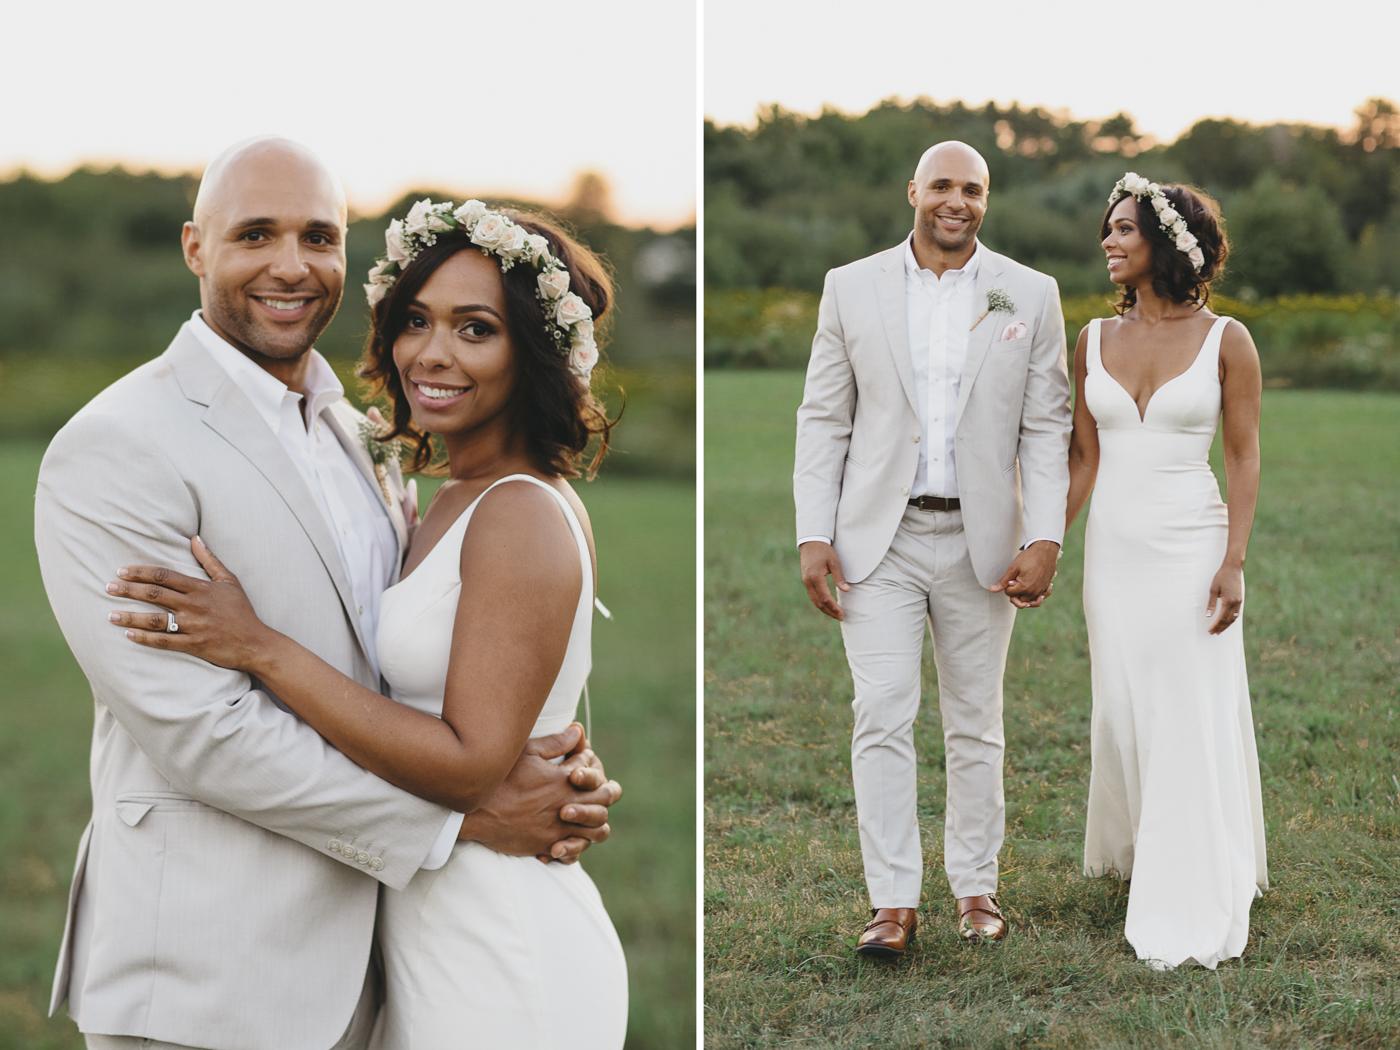 Toni_Earl_Rest_and_Be_Thankful_farm_wedding_maine_024.jpg